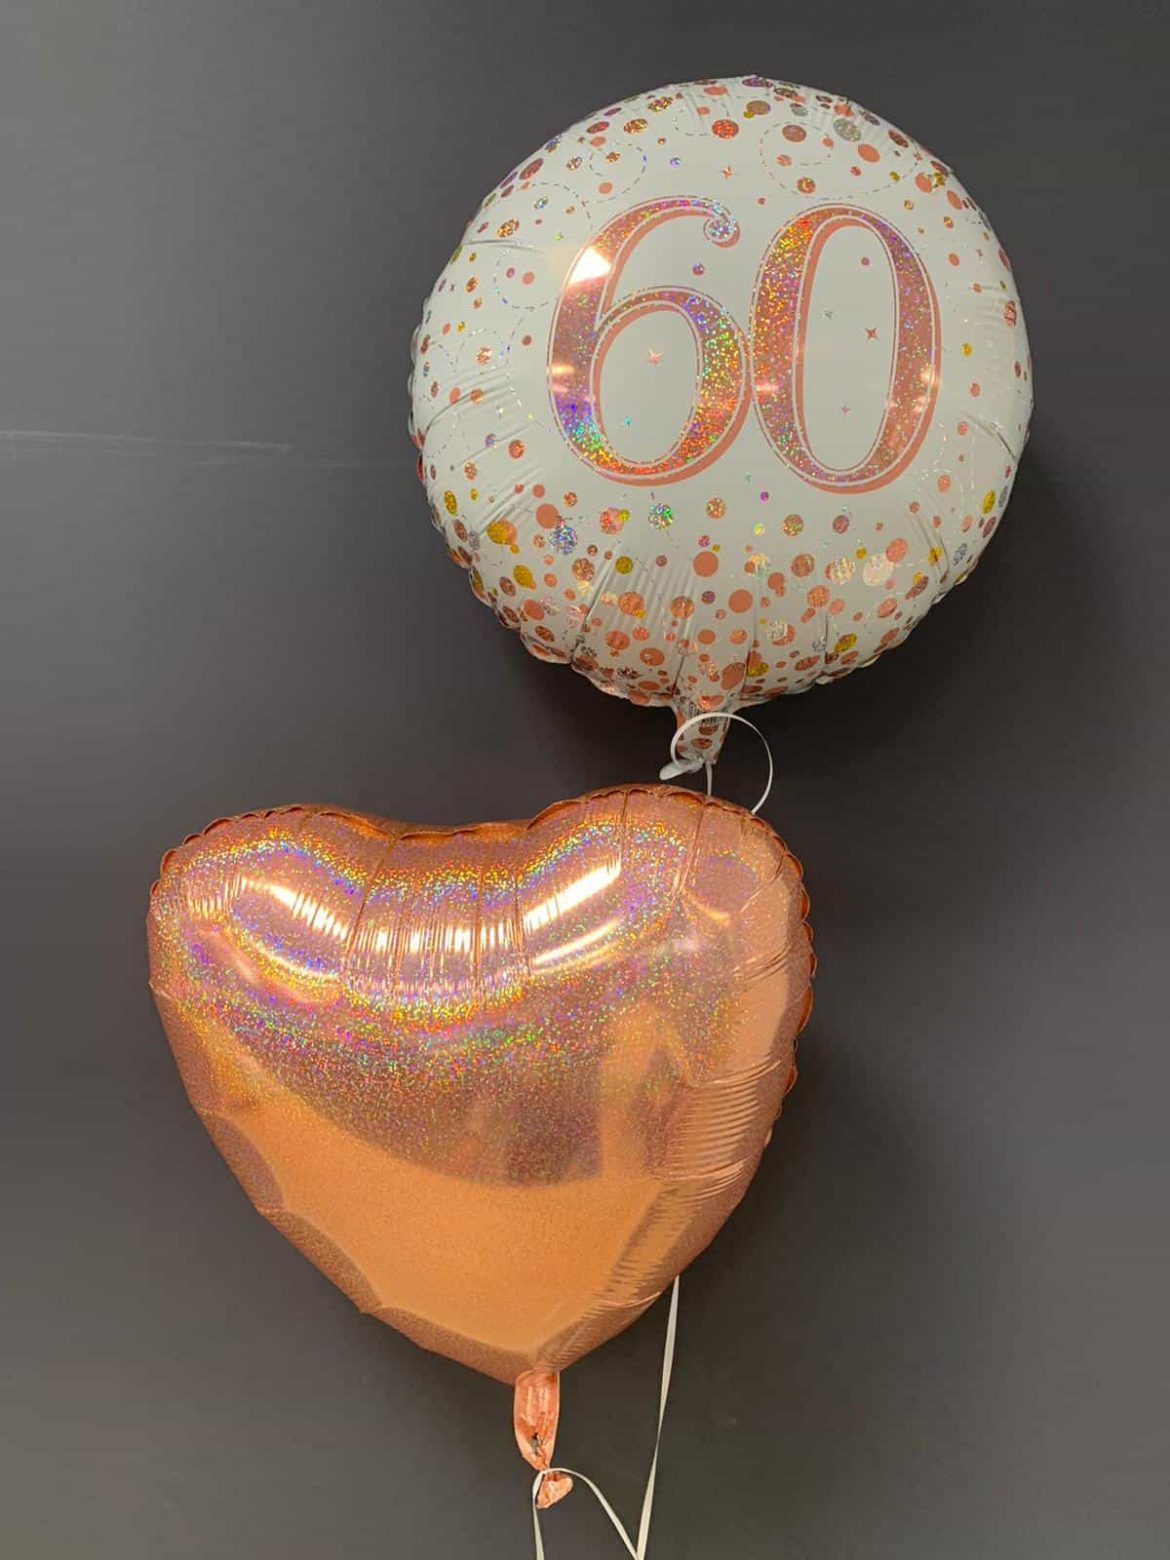 60. Geburtstag €5,50<br />Dekoballon rosegold €4,50 1